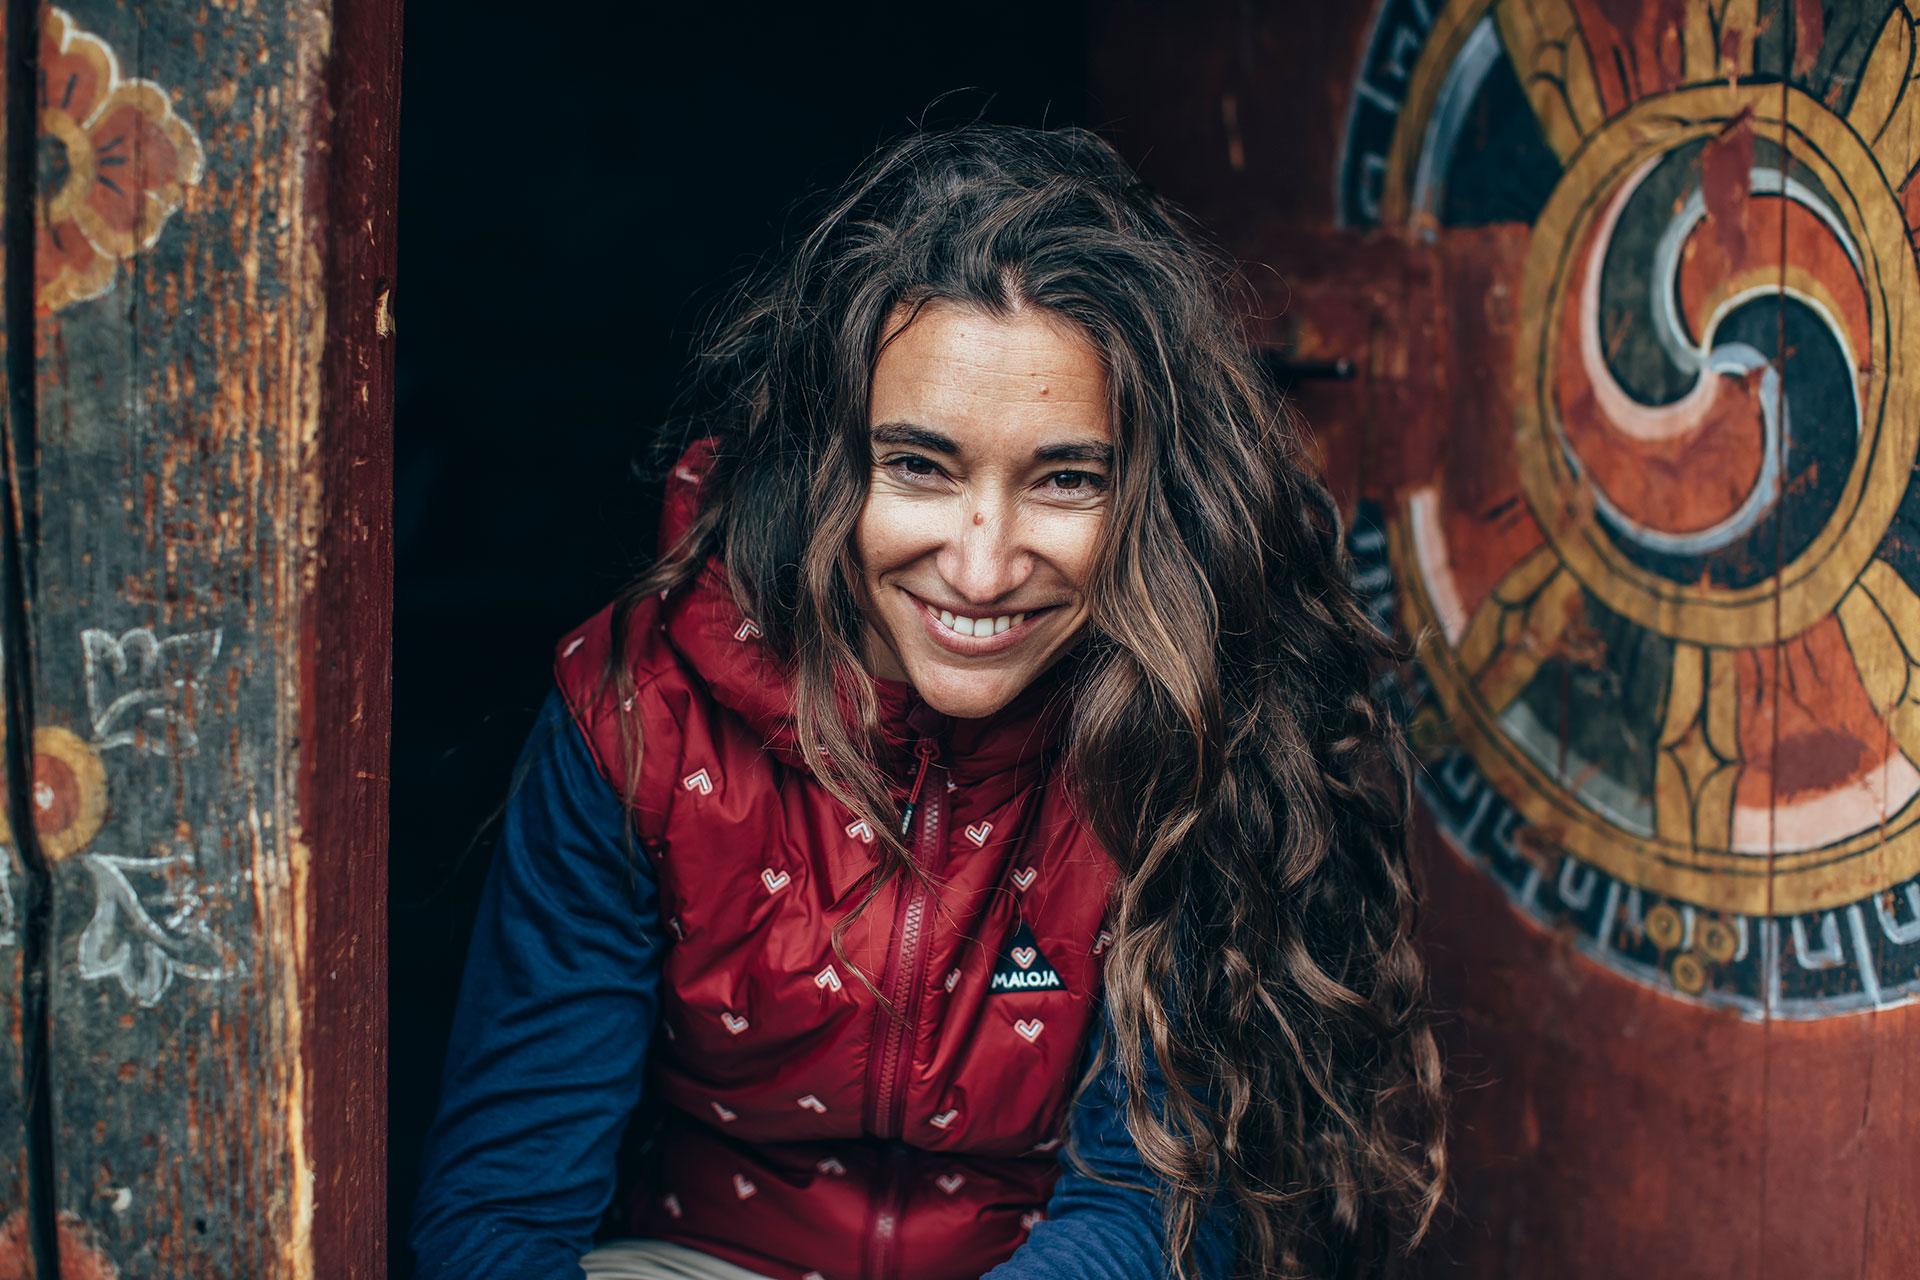 People Lifestyle Outdoor Fotograf Michael Müller Trekking Bhutan Reise Portrait